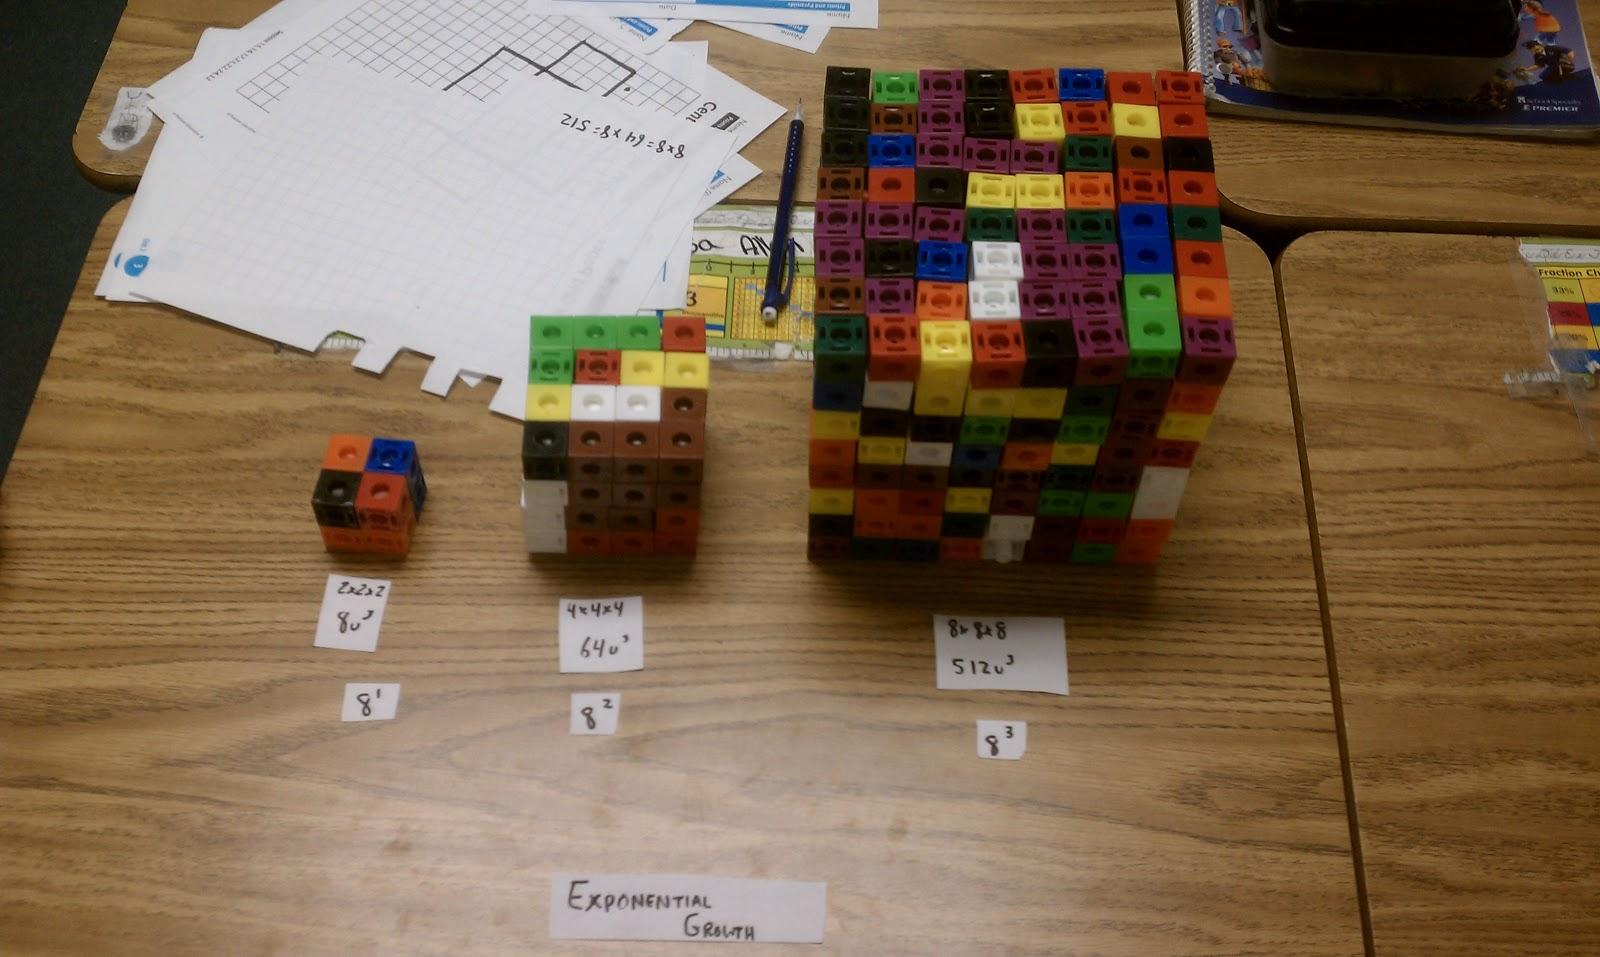 Bus L Teacher Resources 5th Grade Math Unit Area Perimeter Volume Of Prisms And Pyramids